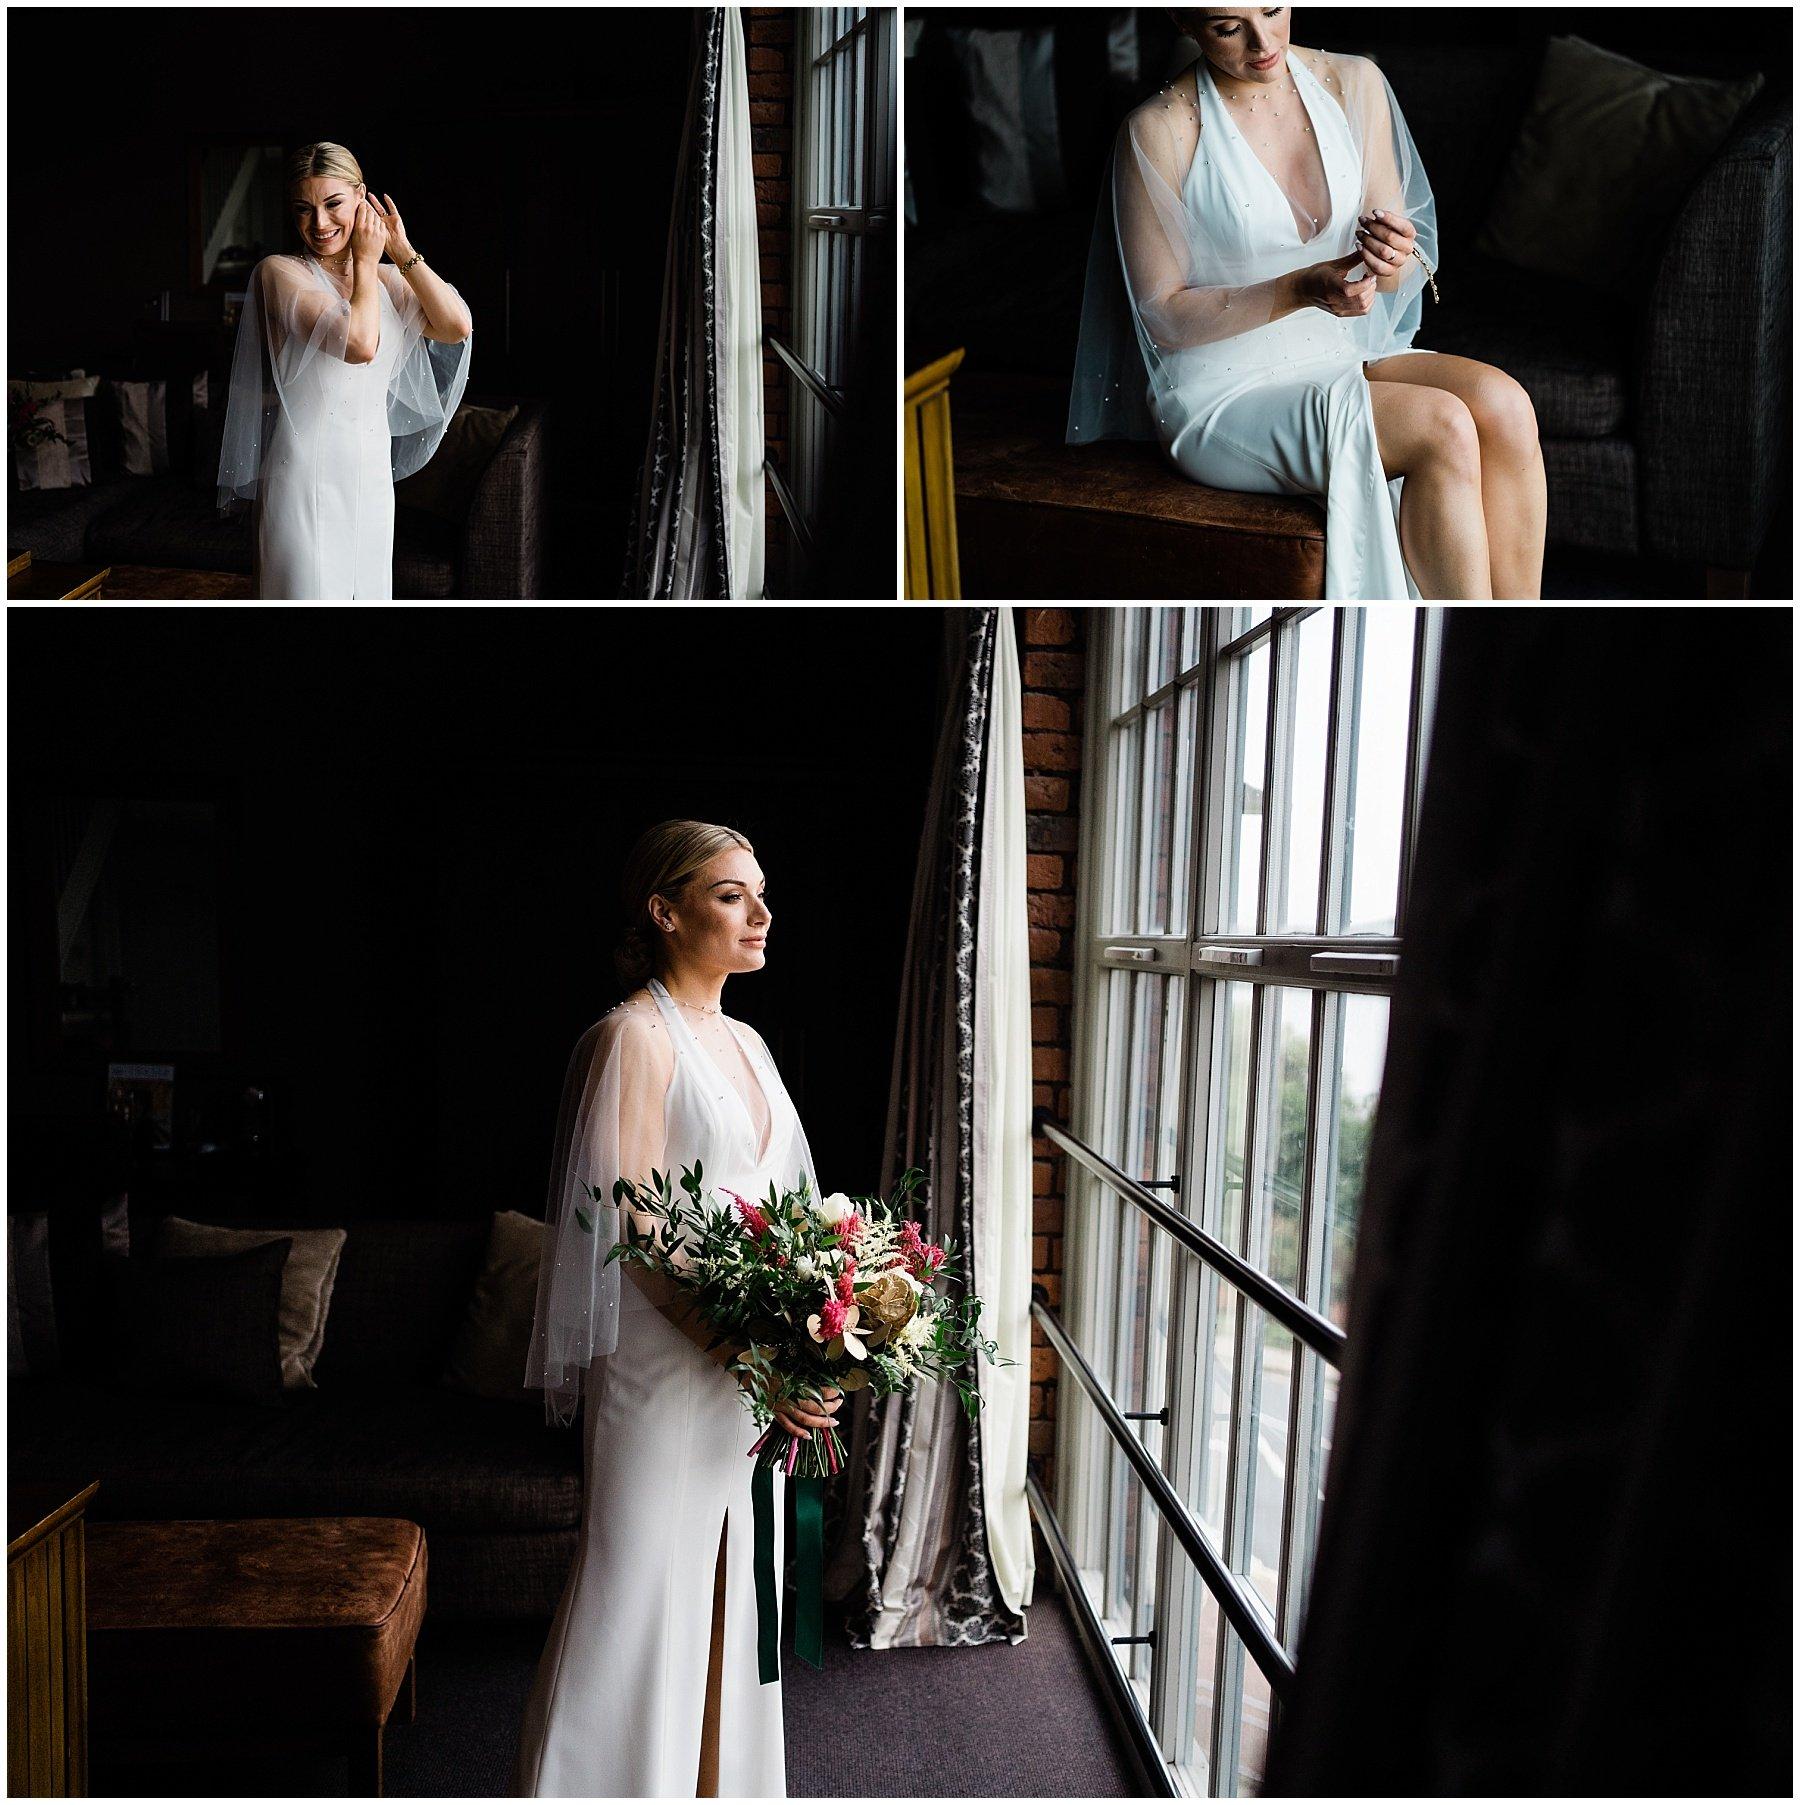 Hotel Du Vin Wedding | Newcastle Wedding photographers | Bridal Preparations